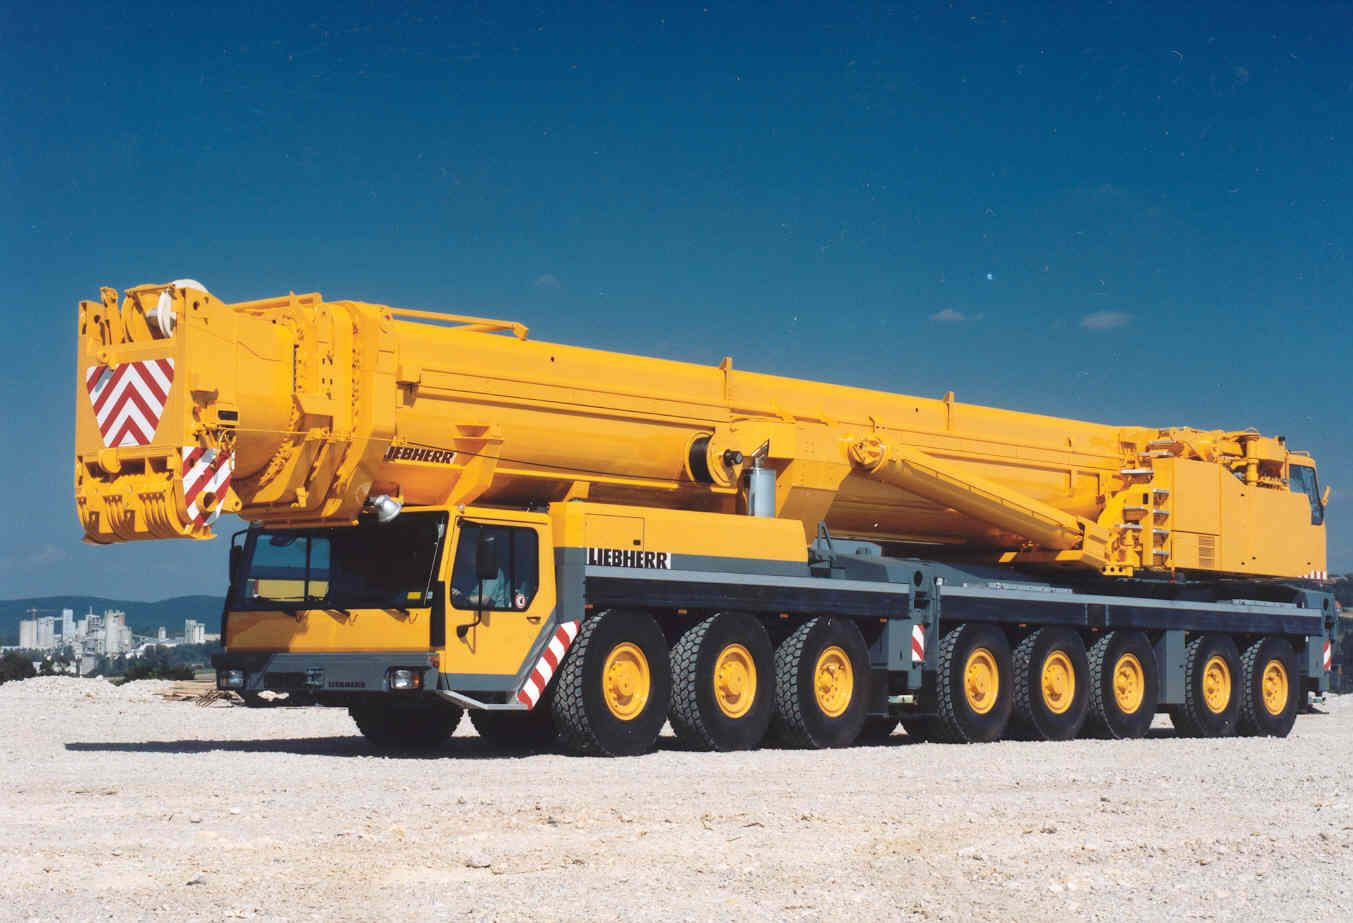 Mobile Crane Pictures : Liebherr ltm crane truck cranes pump